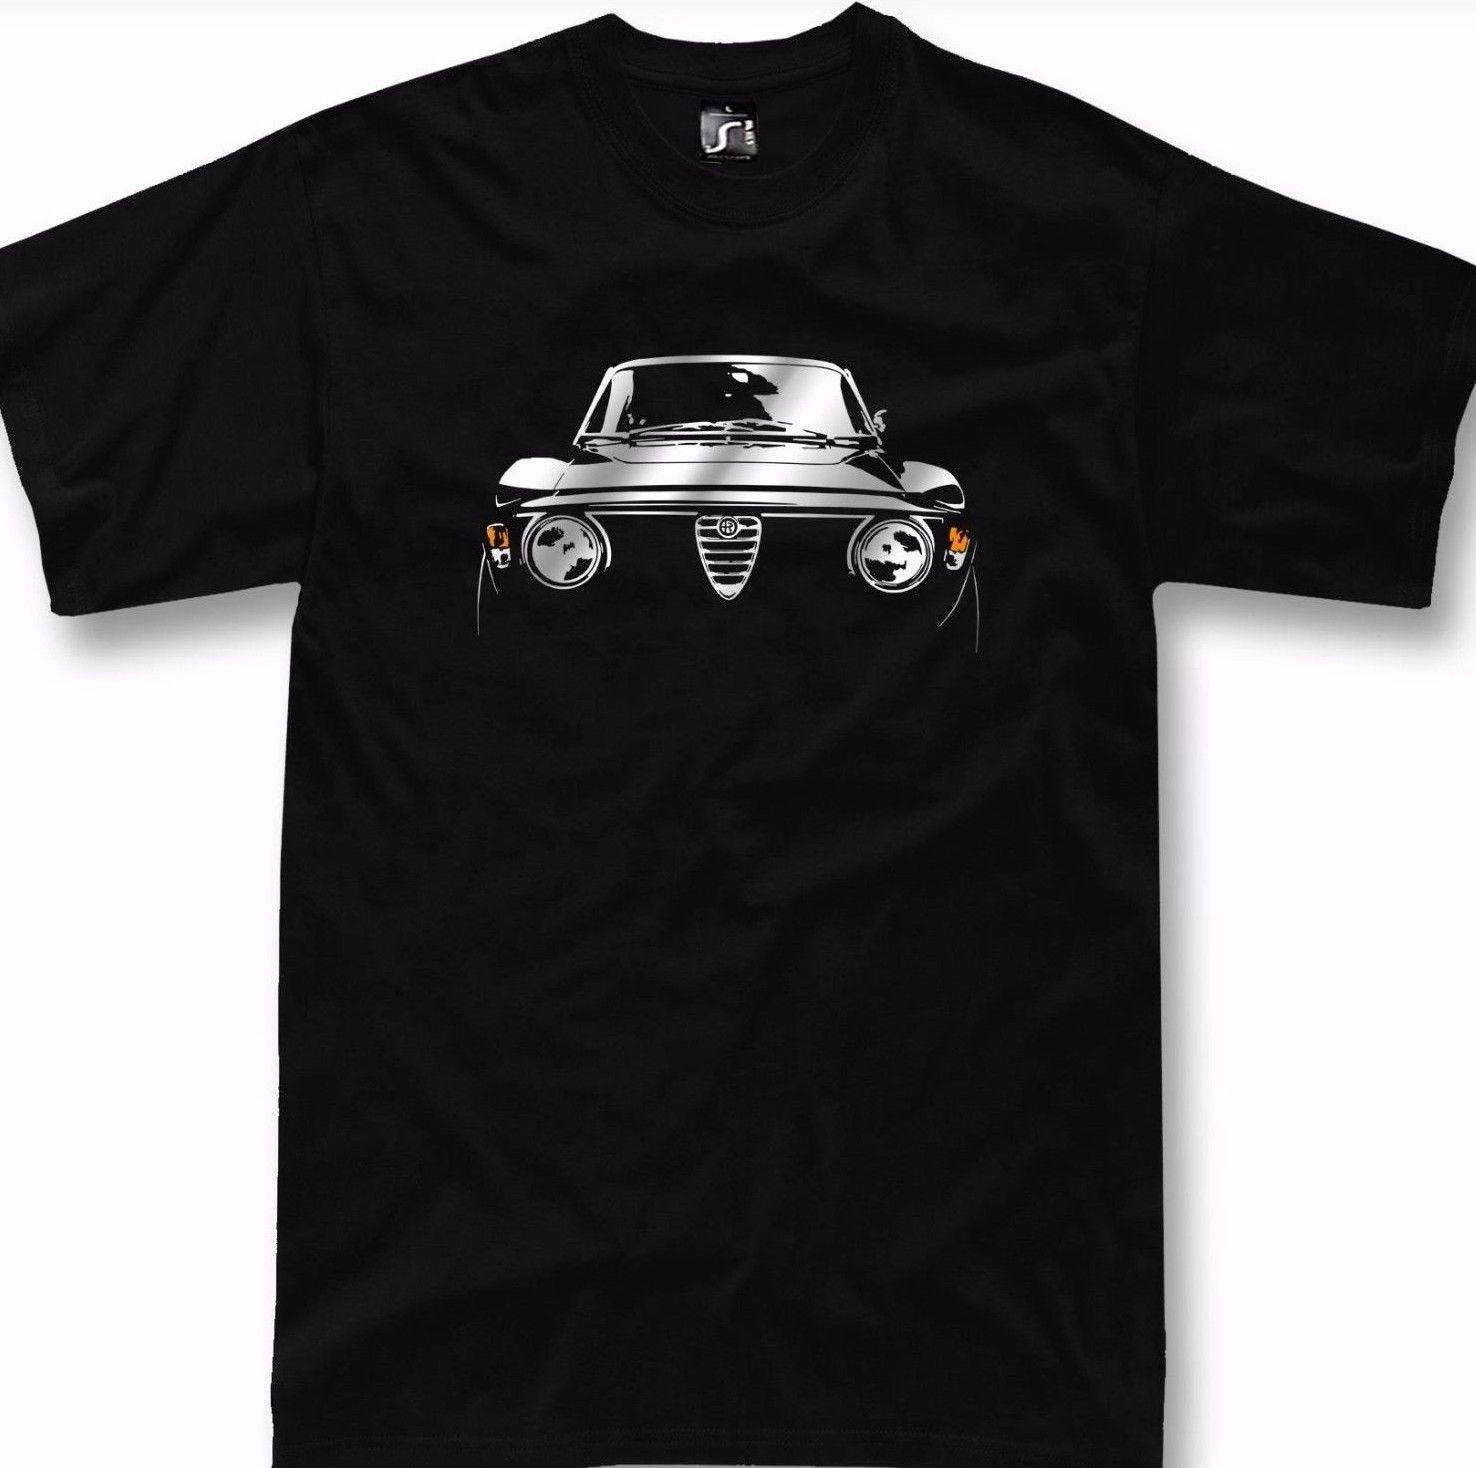 T Shirt For Alfa Romeo Gta Fans Veloce Giulia Gt Classic Tshirt 1750 Sweater 2000 Hoodie 24 Hour Rude Tshirts From Beidhgate02a 1101